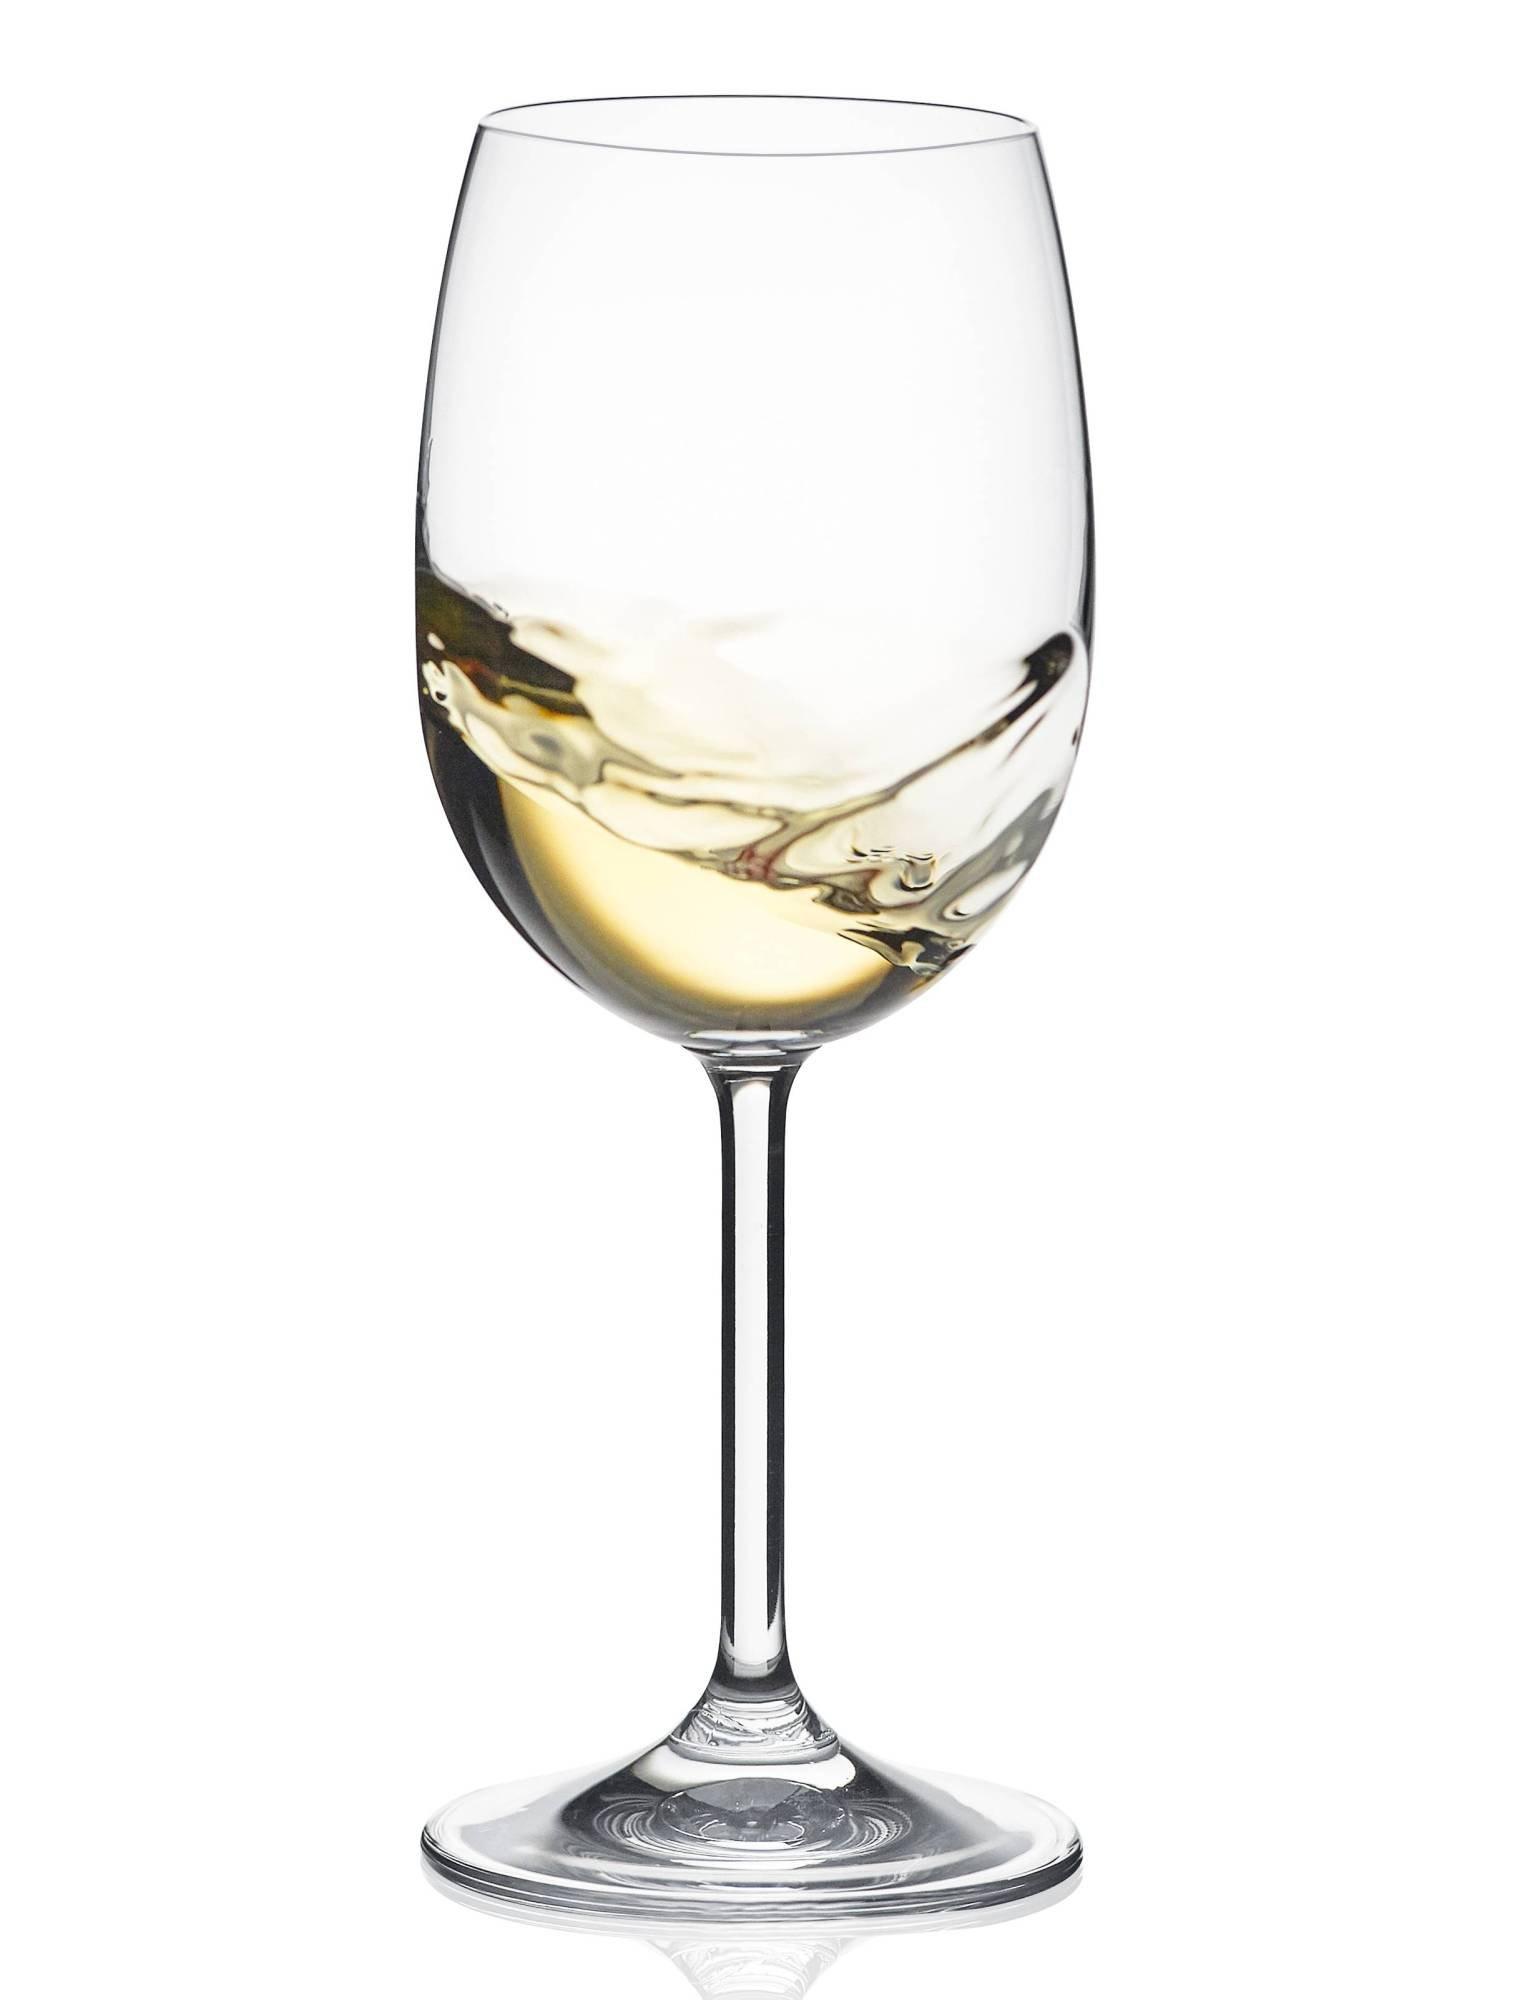 RONA Gala Wine Glass, 9 oz, Set of 6